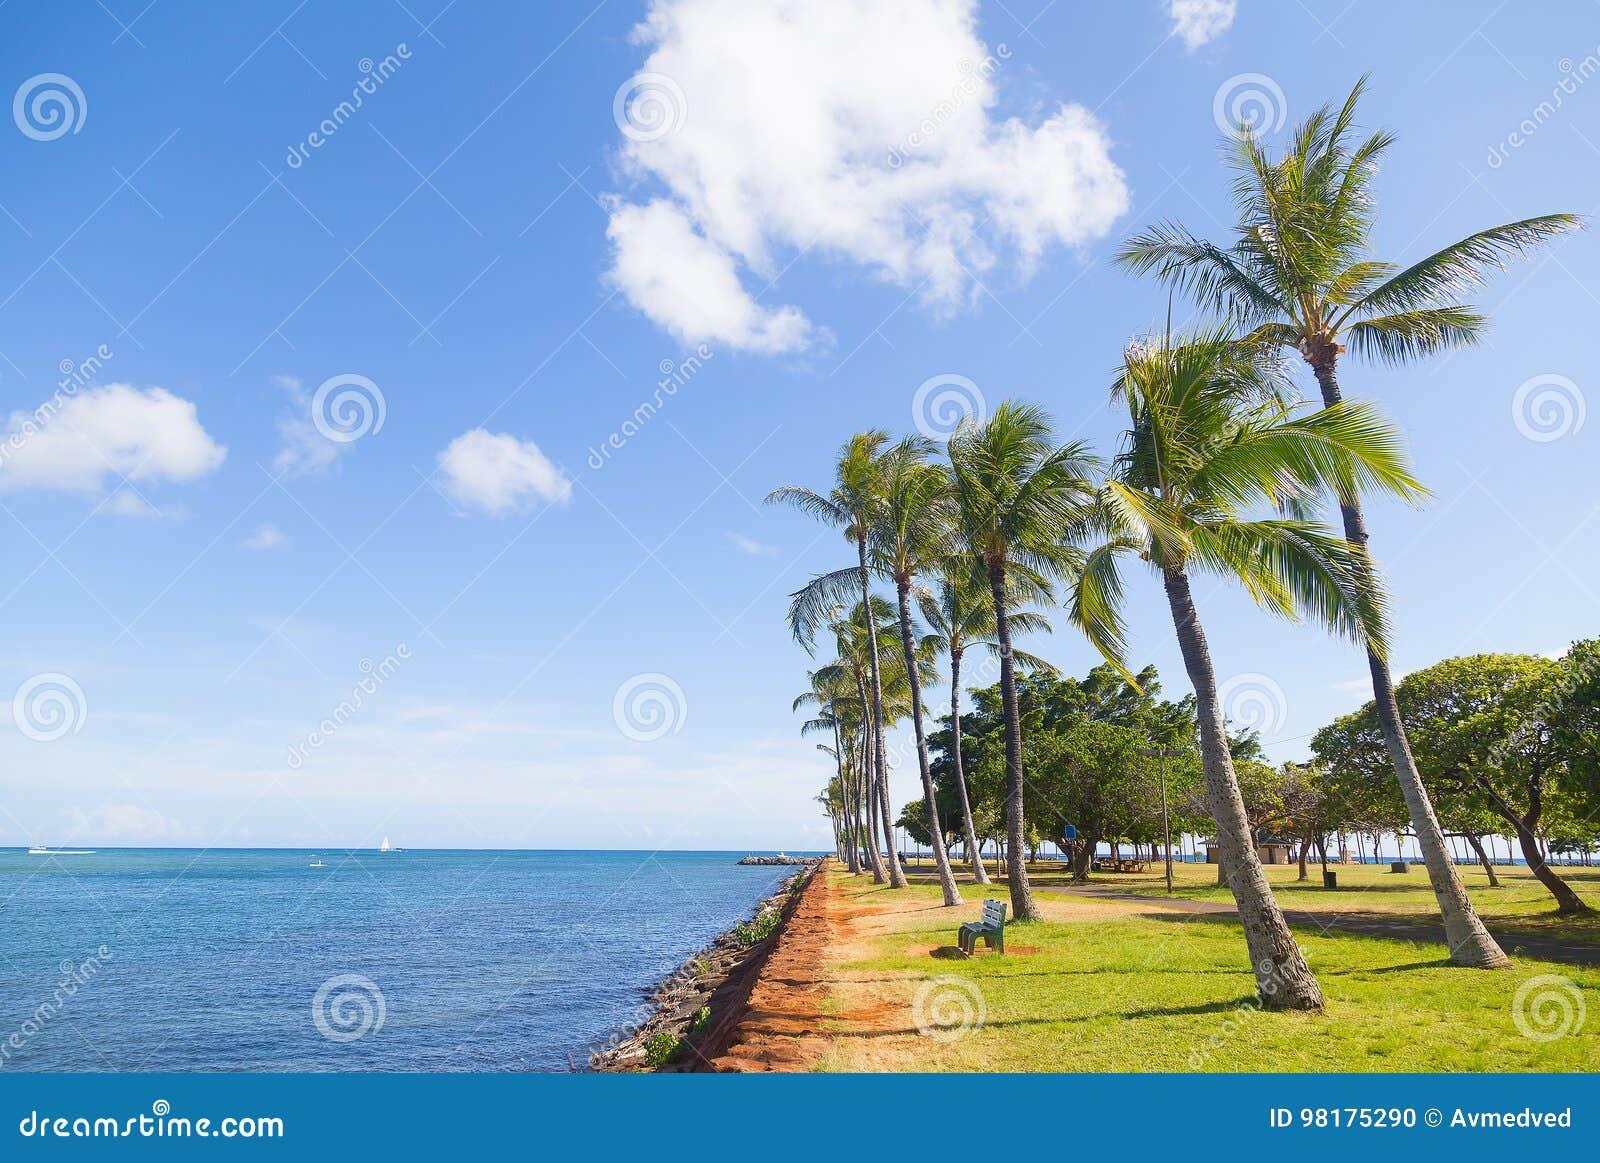 Palm Grove Near Water On The Tropical Island, Hawaii, USA